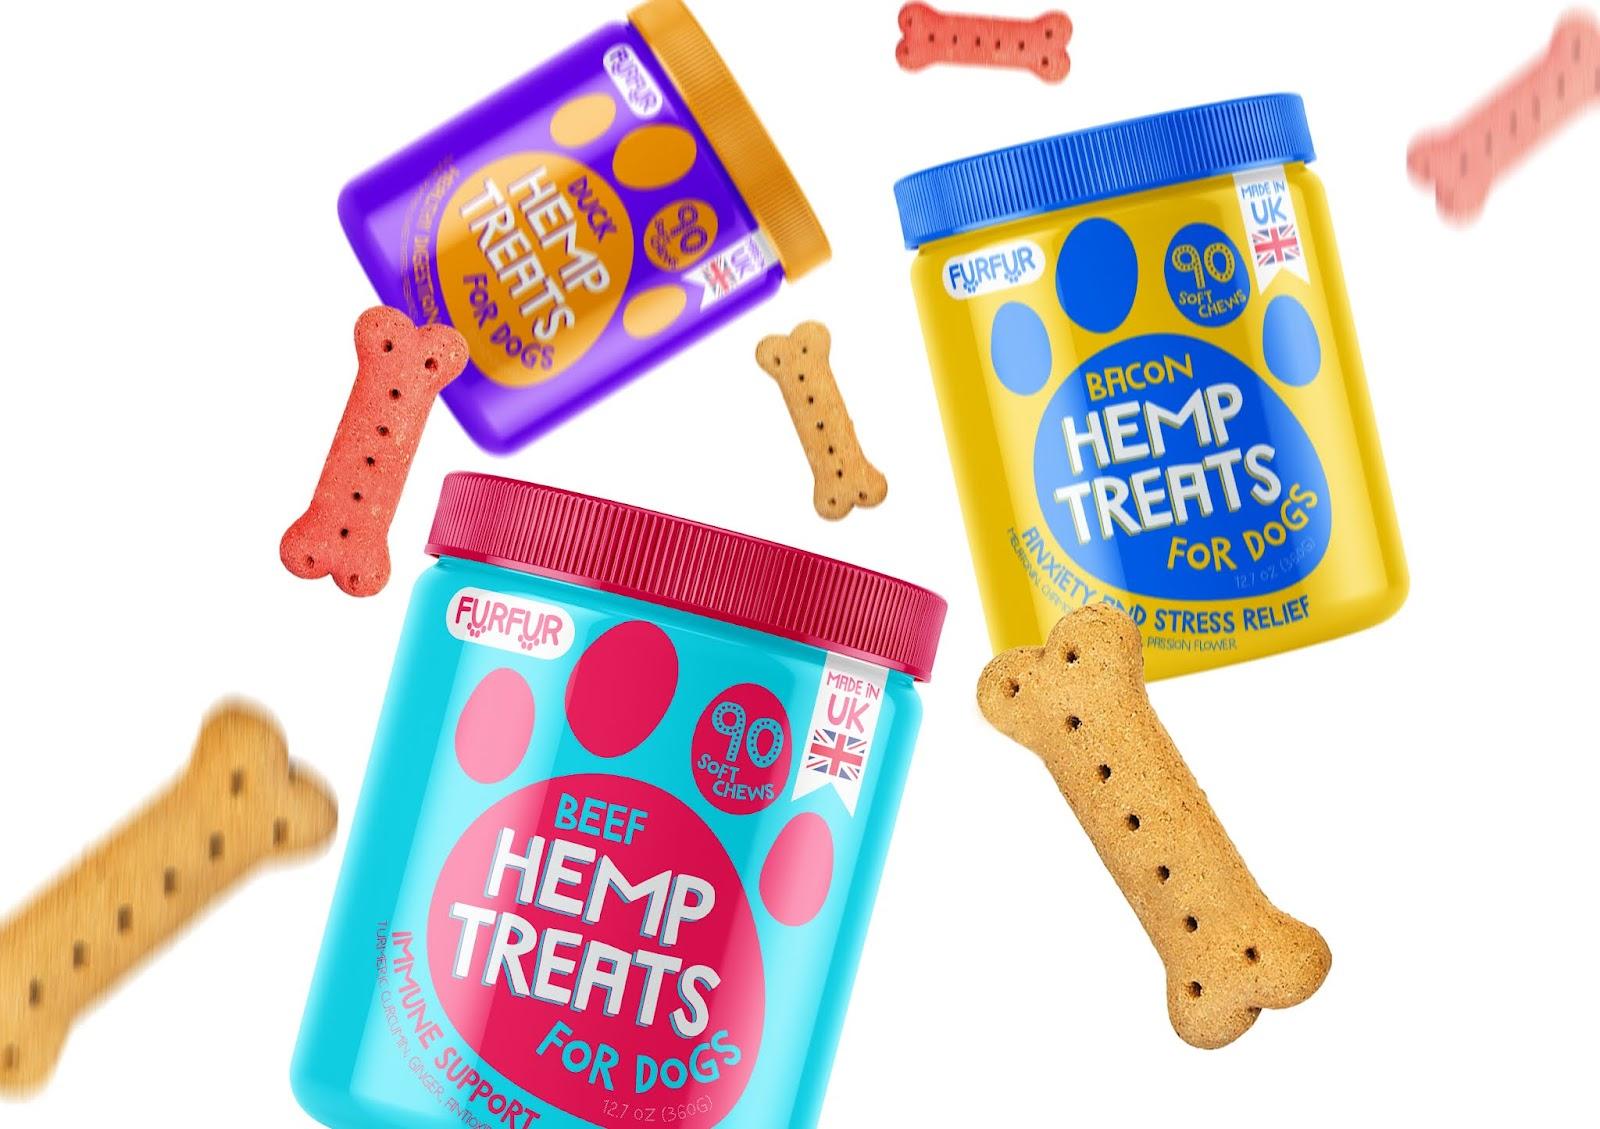 FURFUR – Hemp treats for dogs